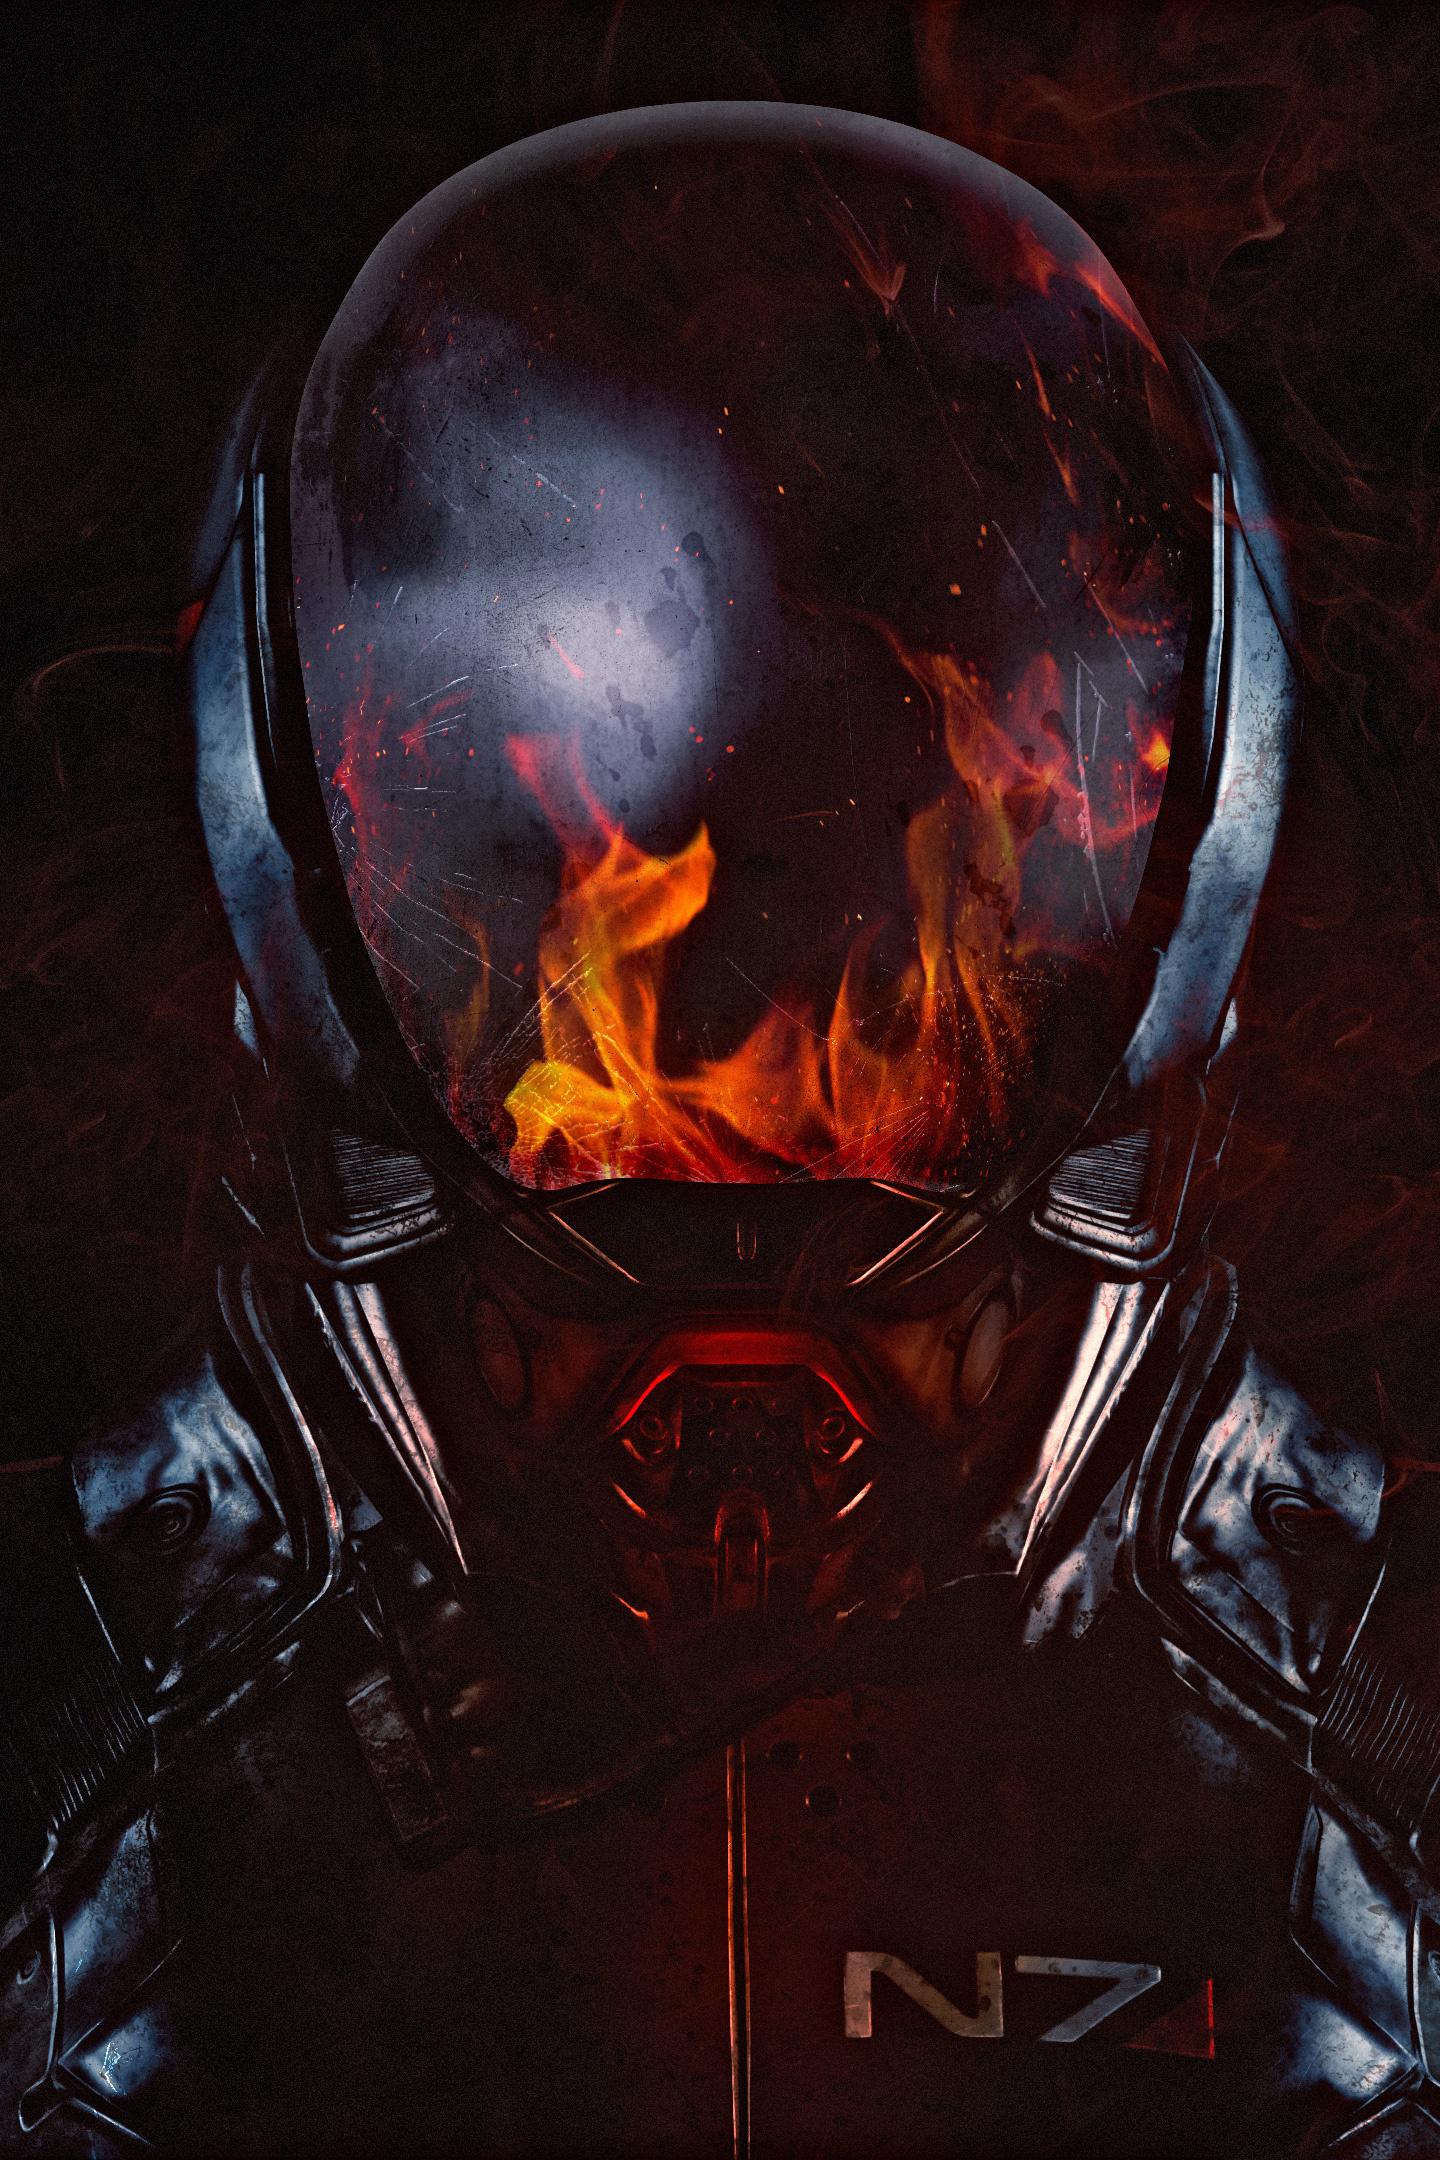 Download 1440x2560 wallpaper mass effect andromeda n7 soldier flame helmet qhd samsung - Mass effect andromeda 1920x1080 ...